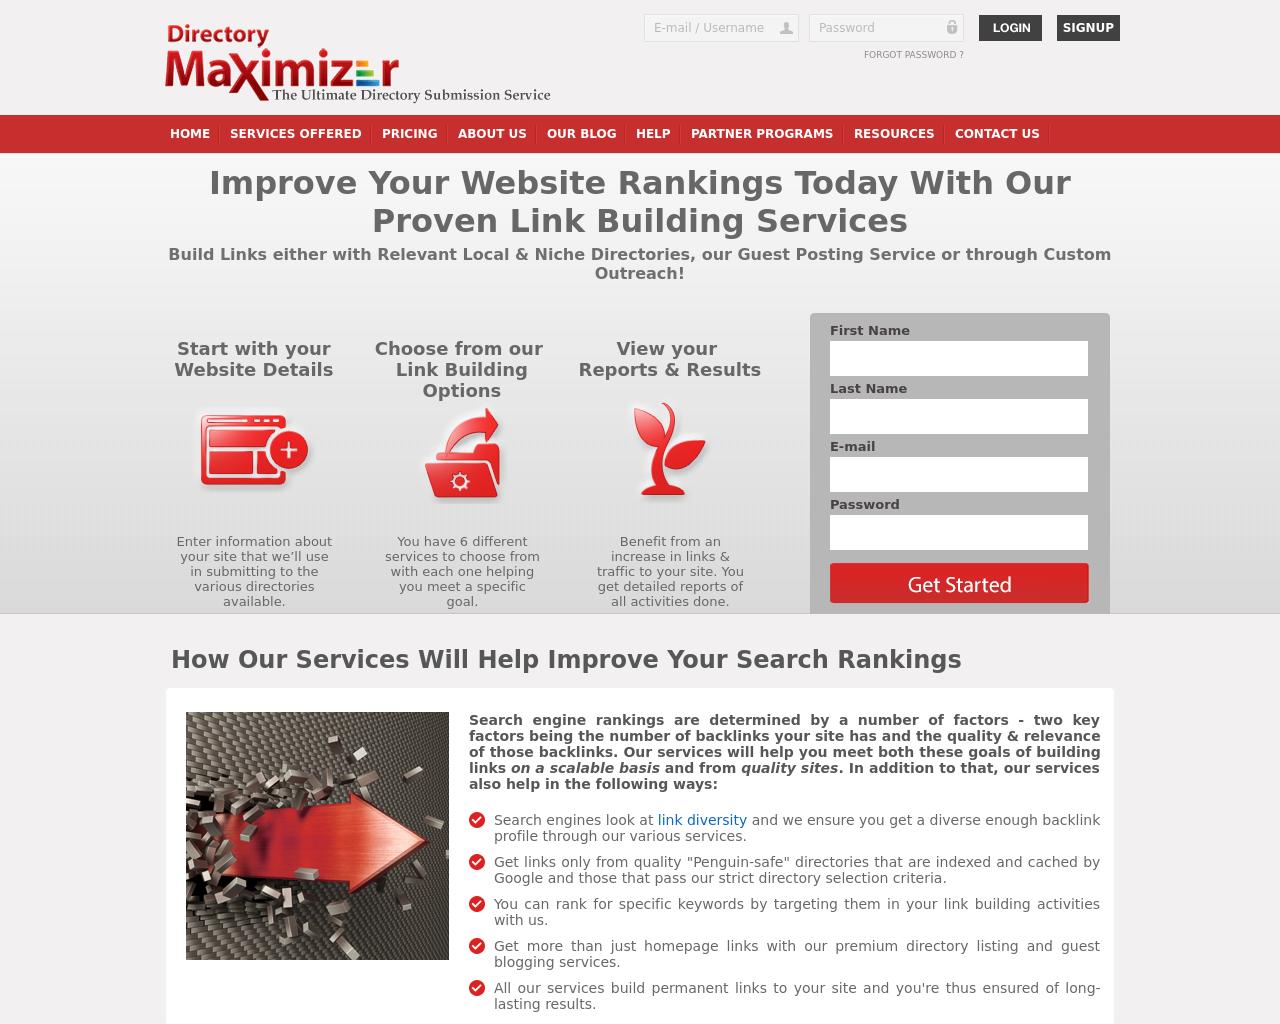 Directory-Maximizer-Advertising-Reviews-Pricing